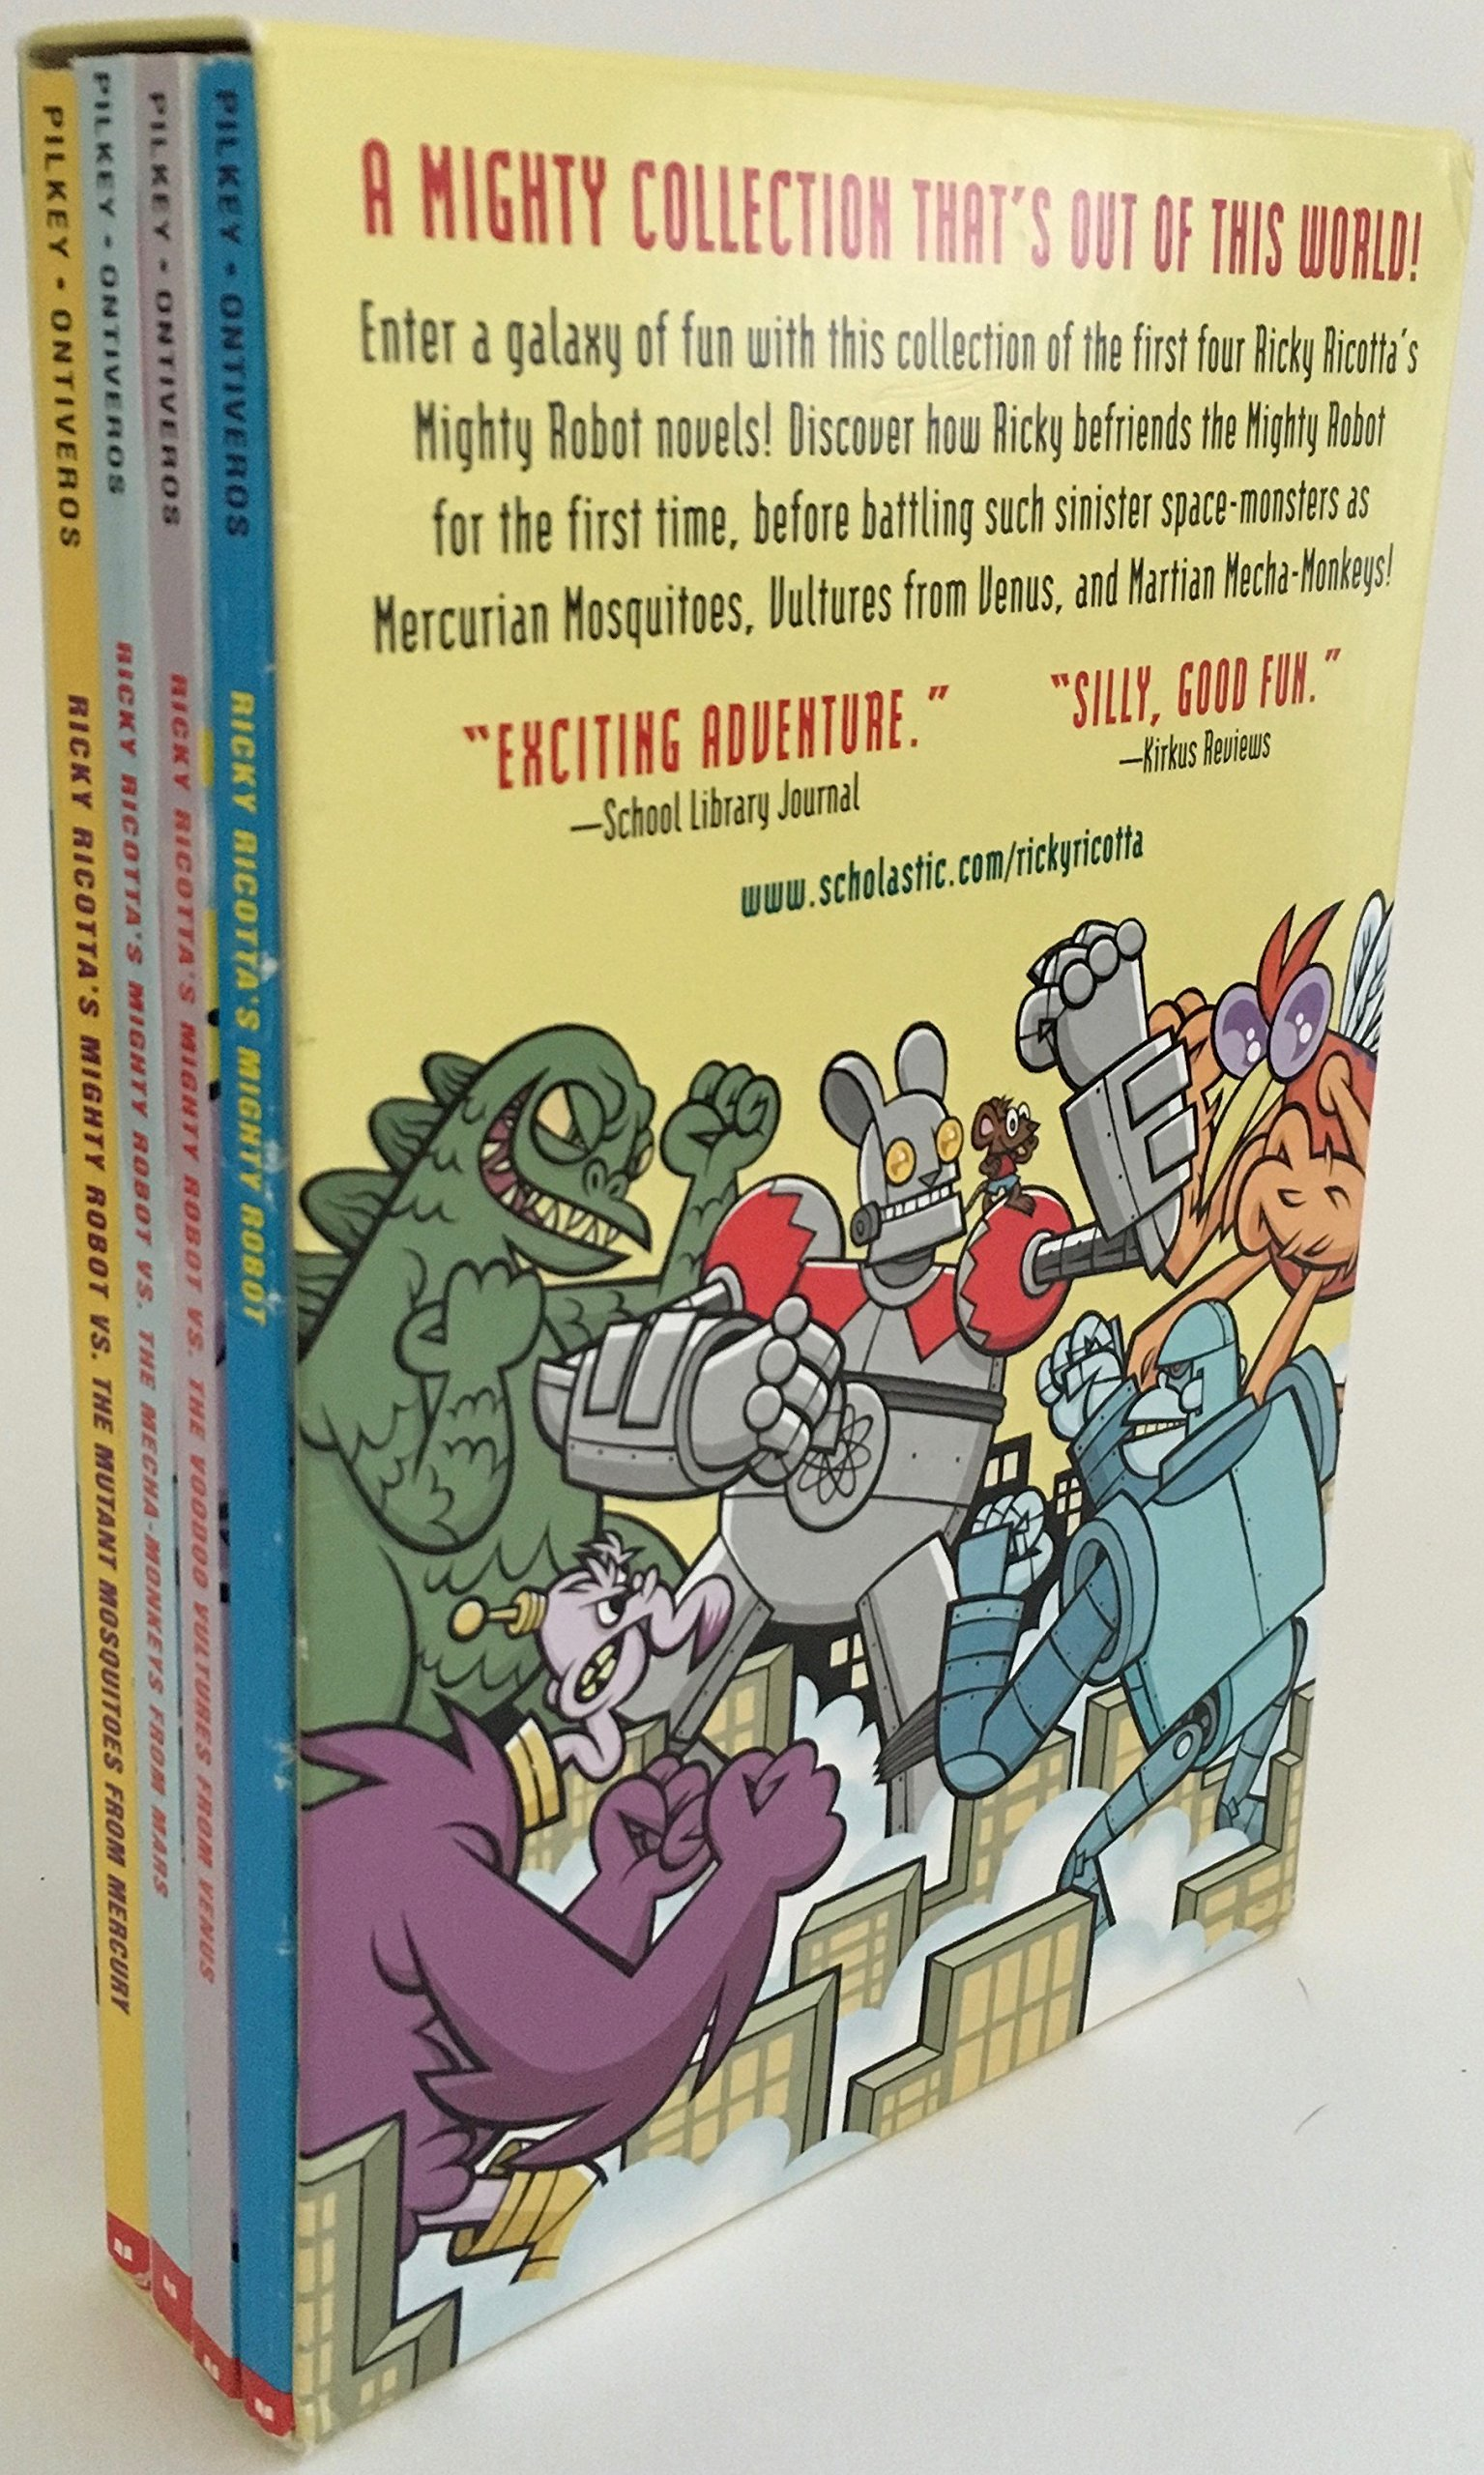 Amazon.com: Ricky Ricotta's Mighty Robot Collection (Books 1-4)  (9780439435222): Dav Pilkey, Martin Ontiveros: Books